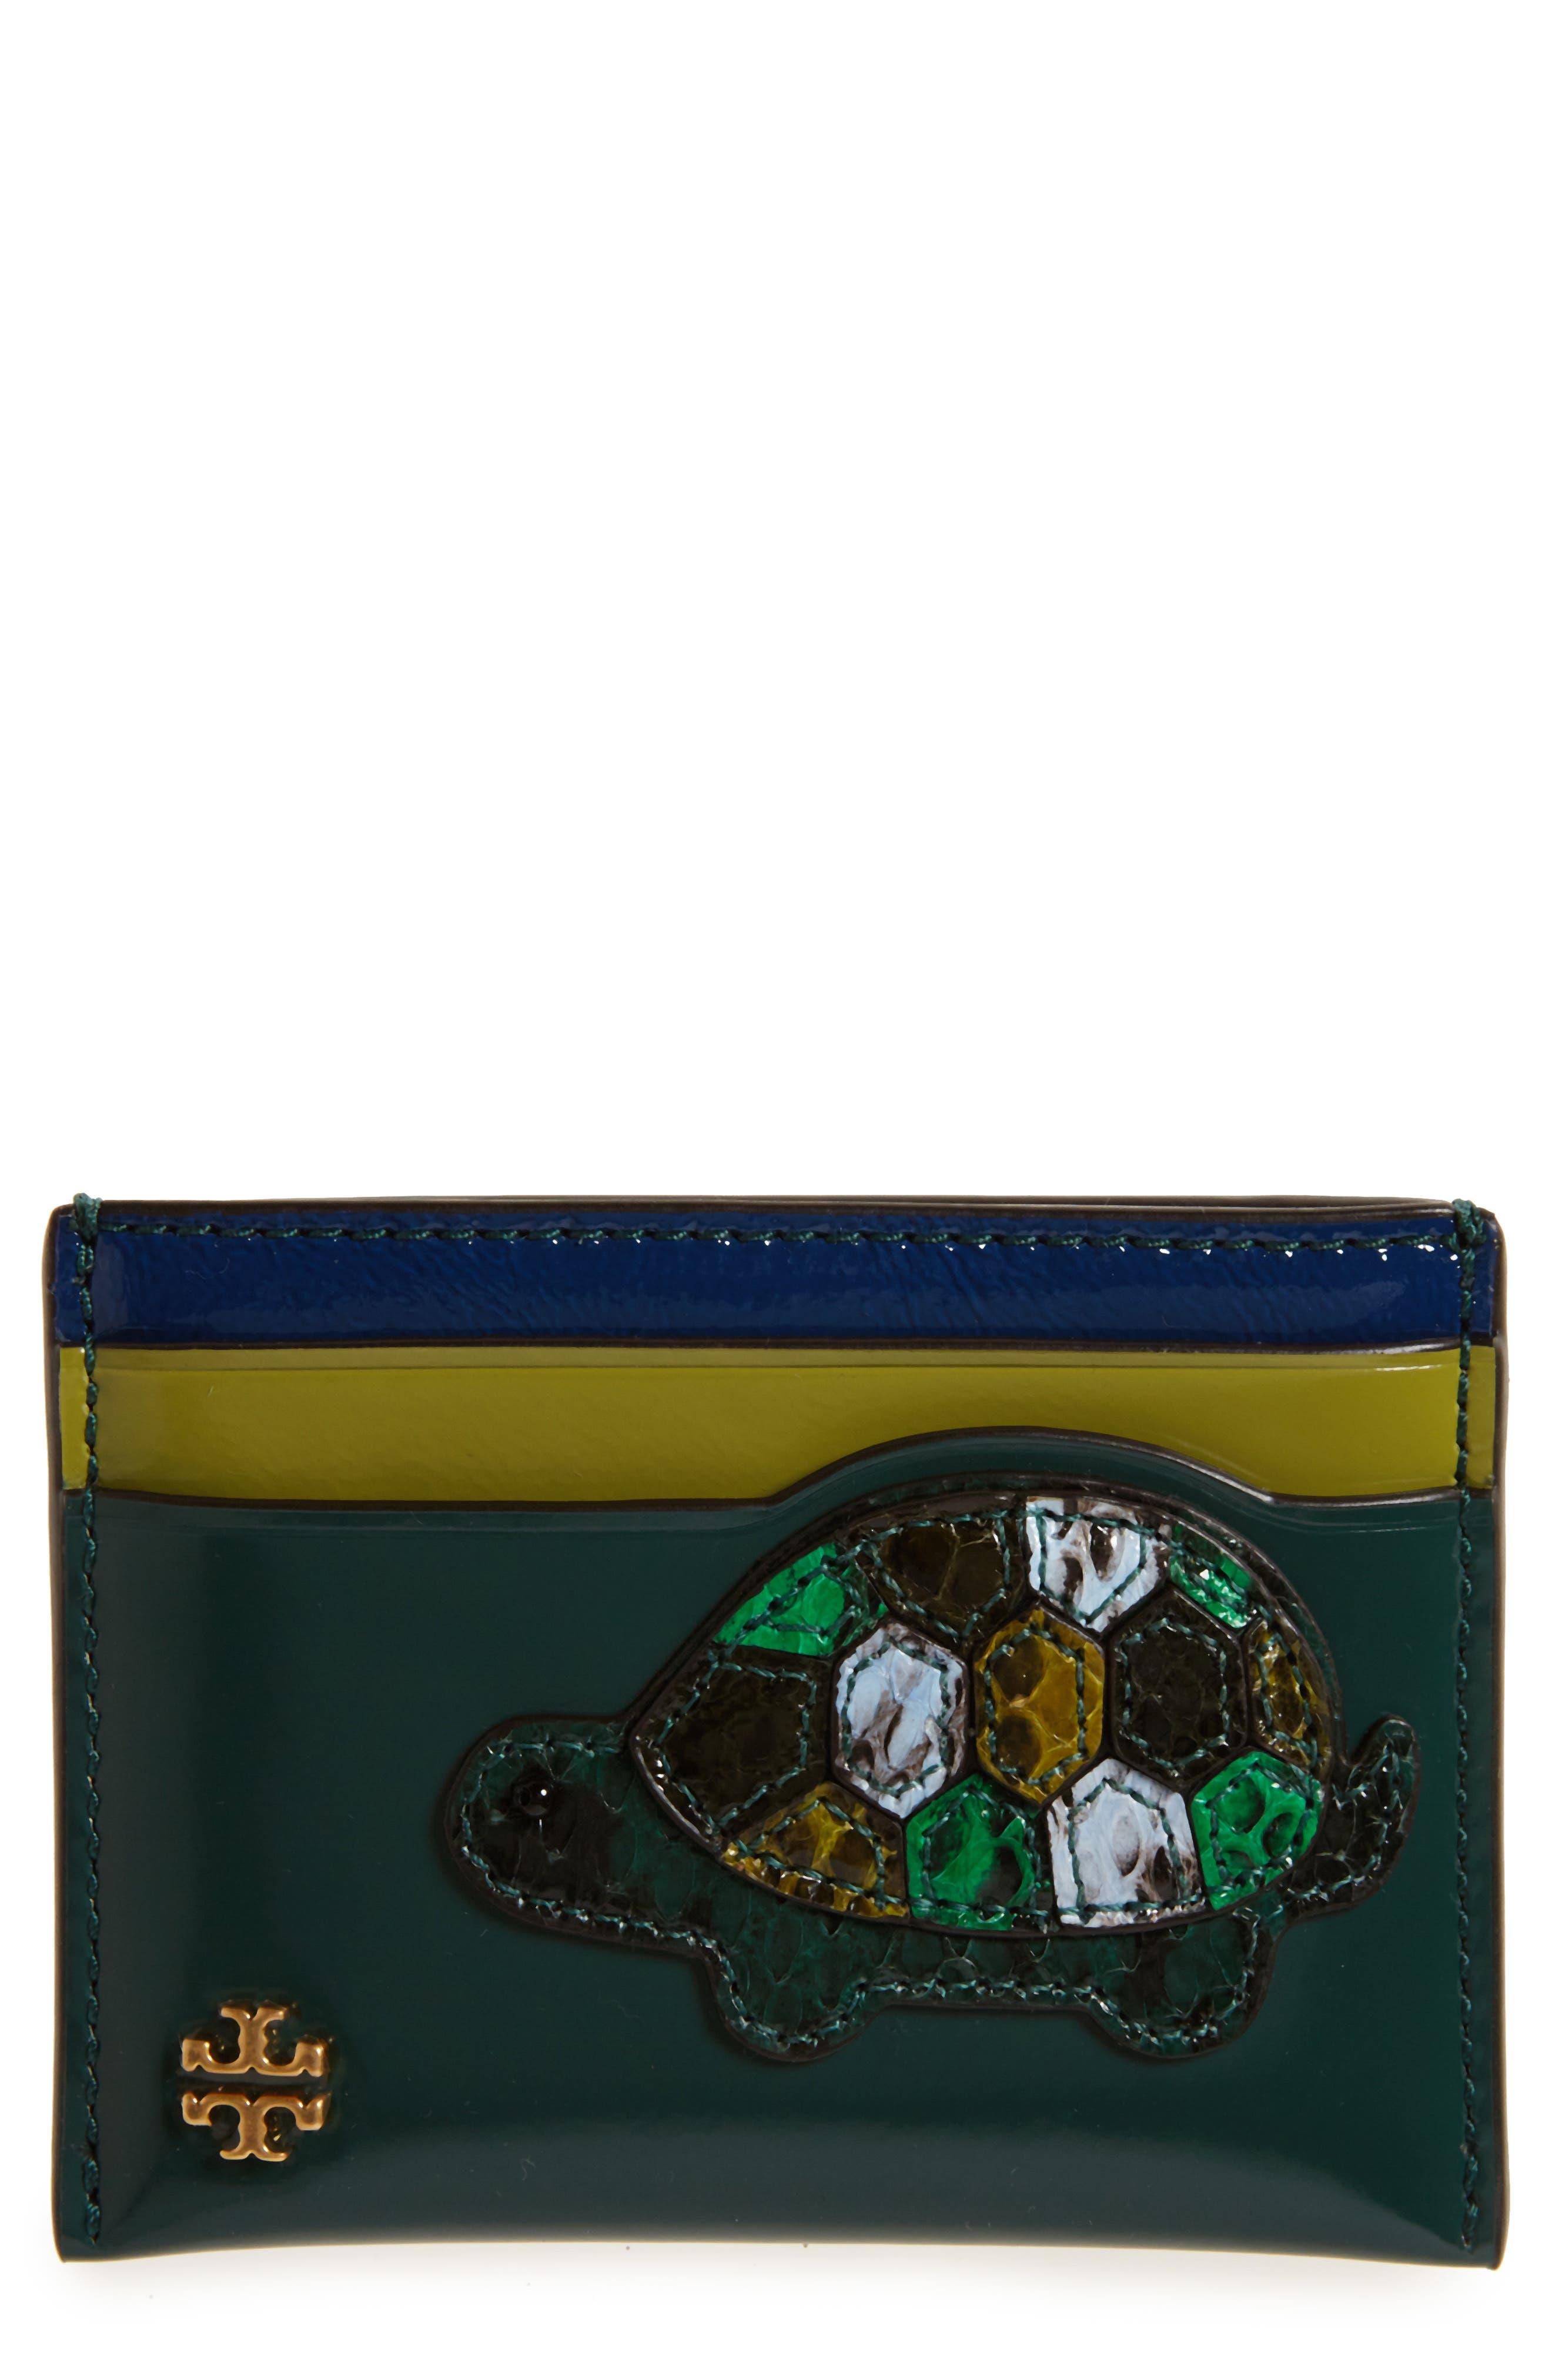 Turtle Appliqué Leather & Genuine Snakeskin Card Case,                             Main thumbnail 1, color,                             318